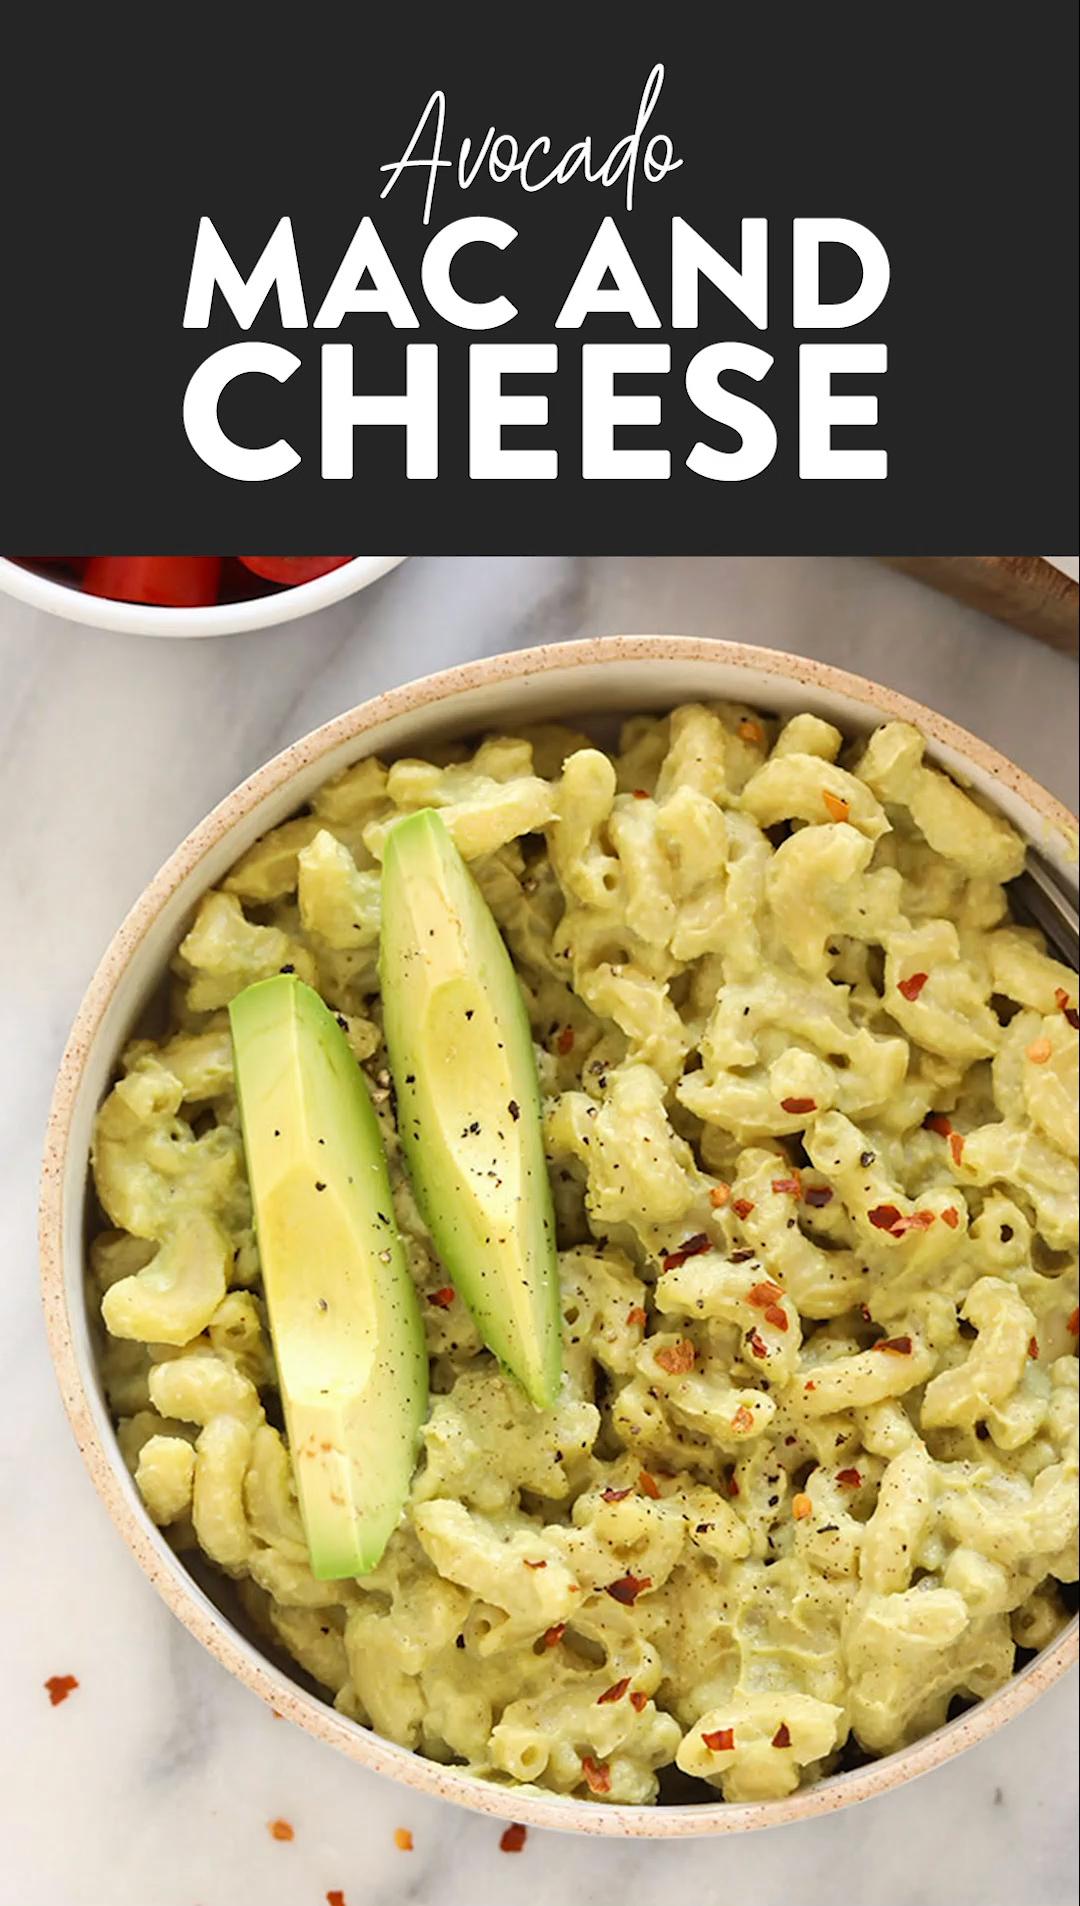 Photo of Vegan Avocado Mac and Cheese